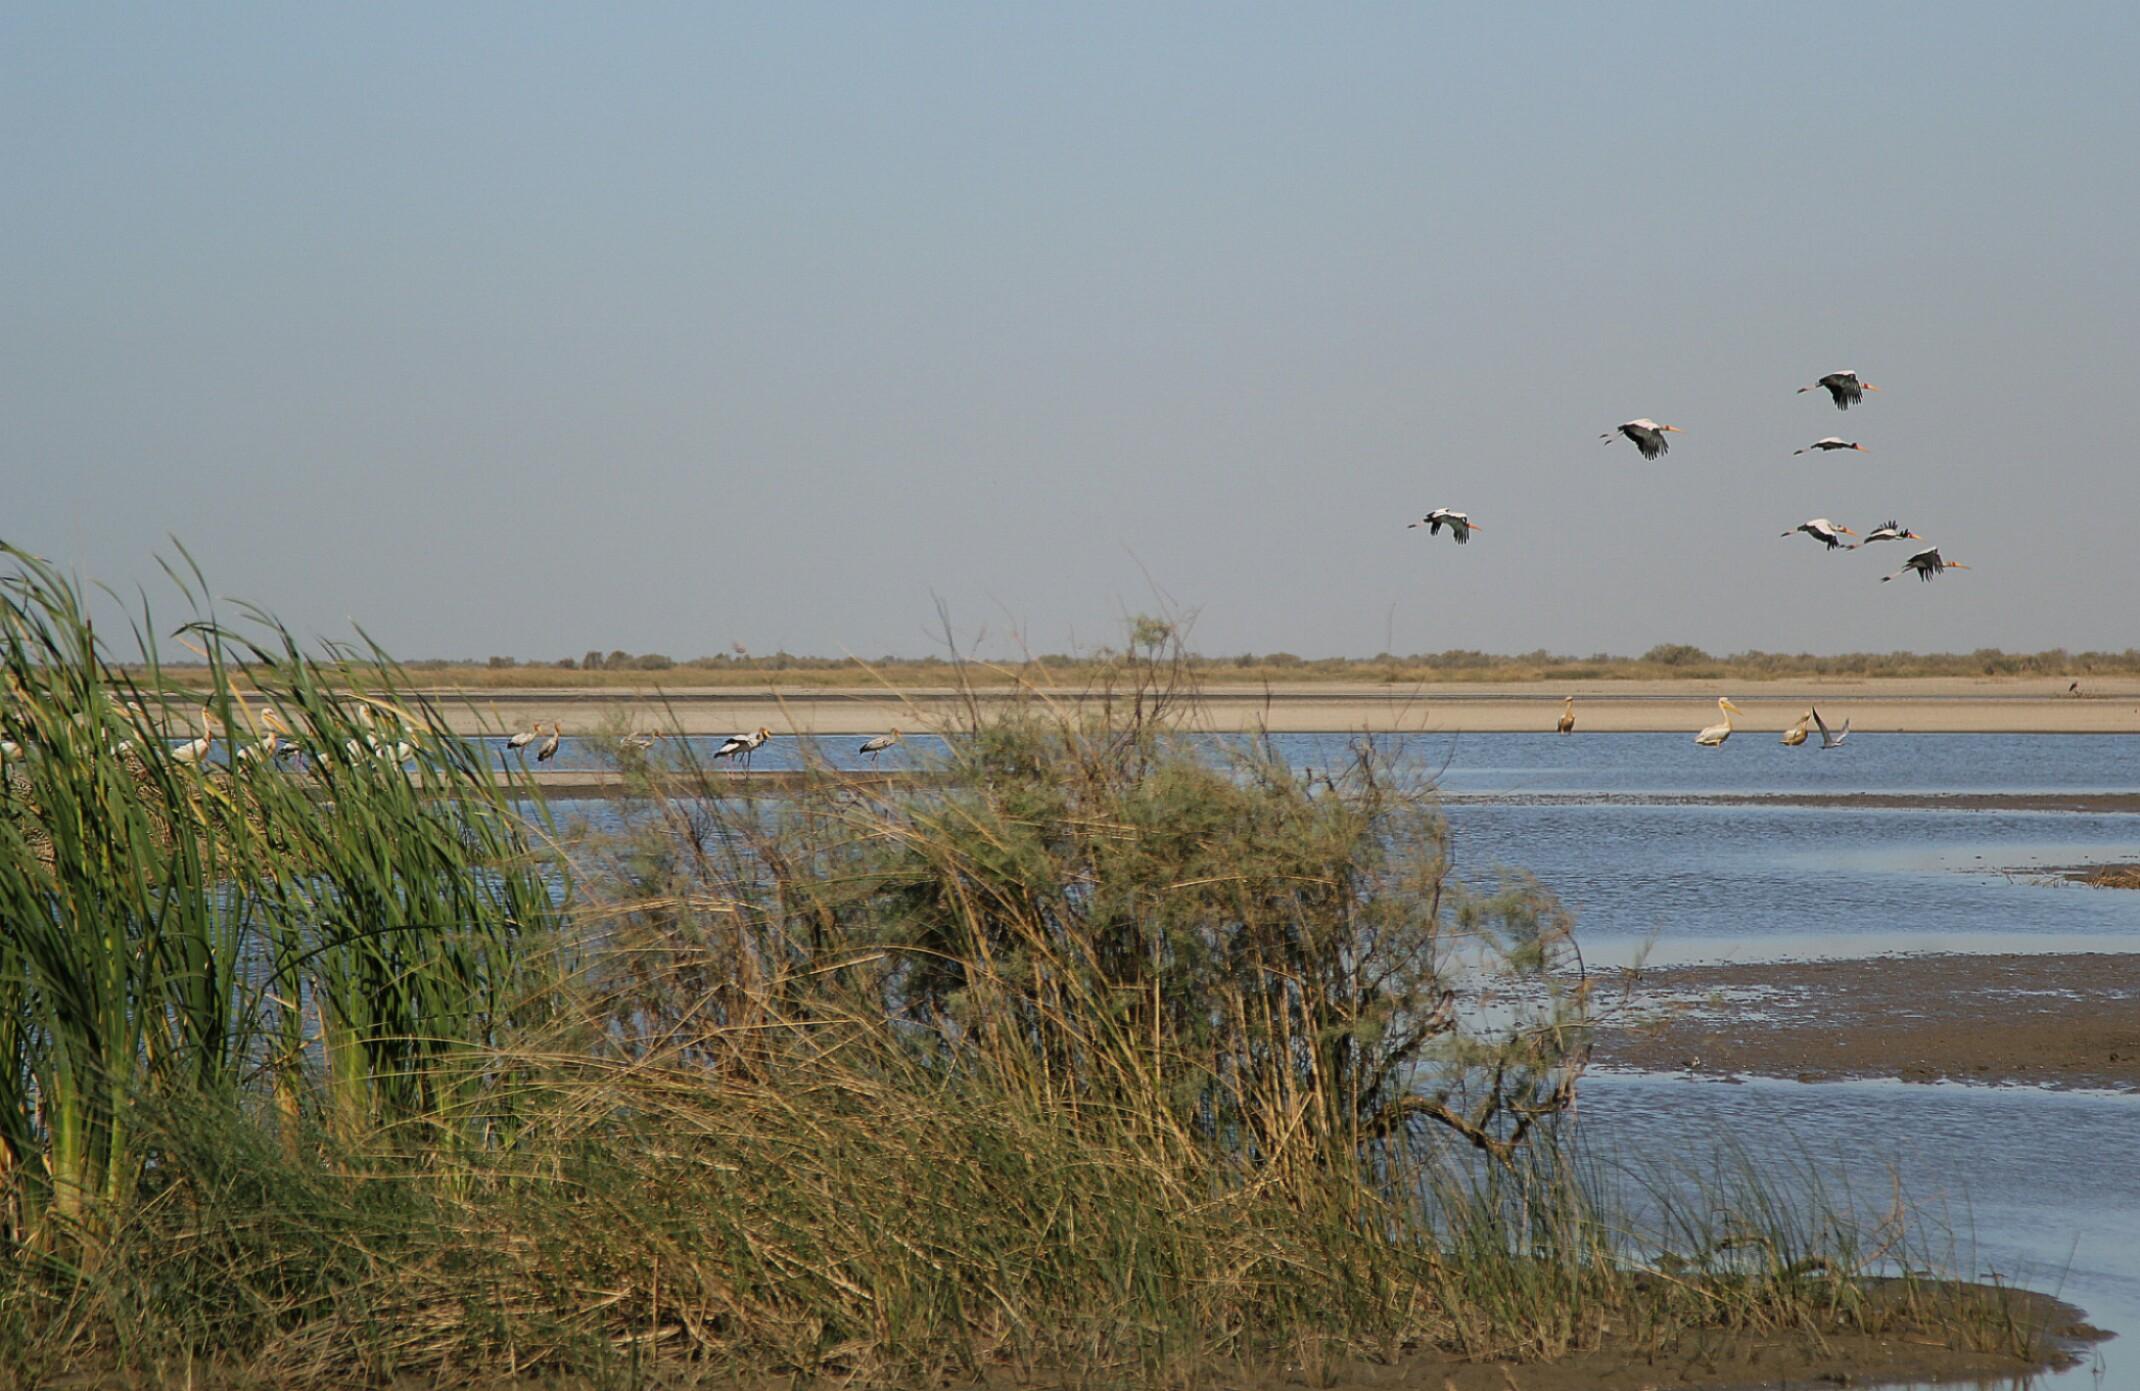 Mauretania,Prac National du Diawling